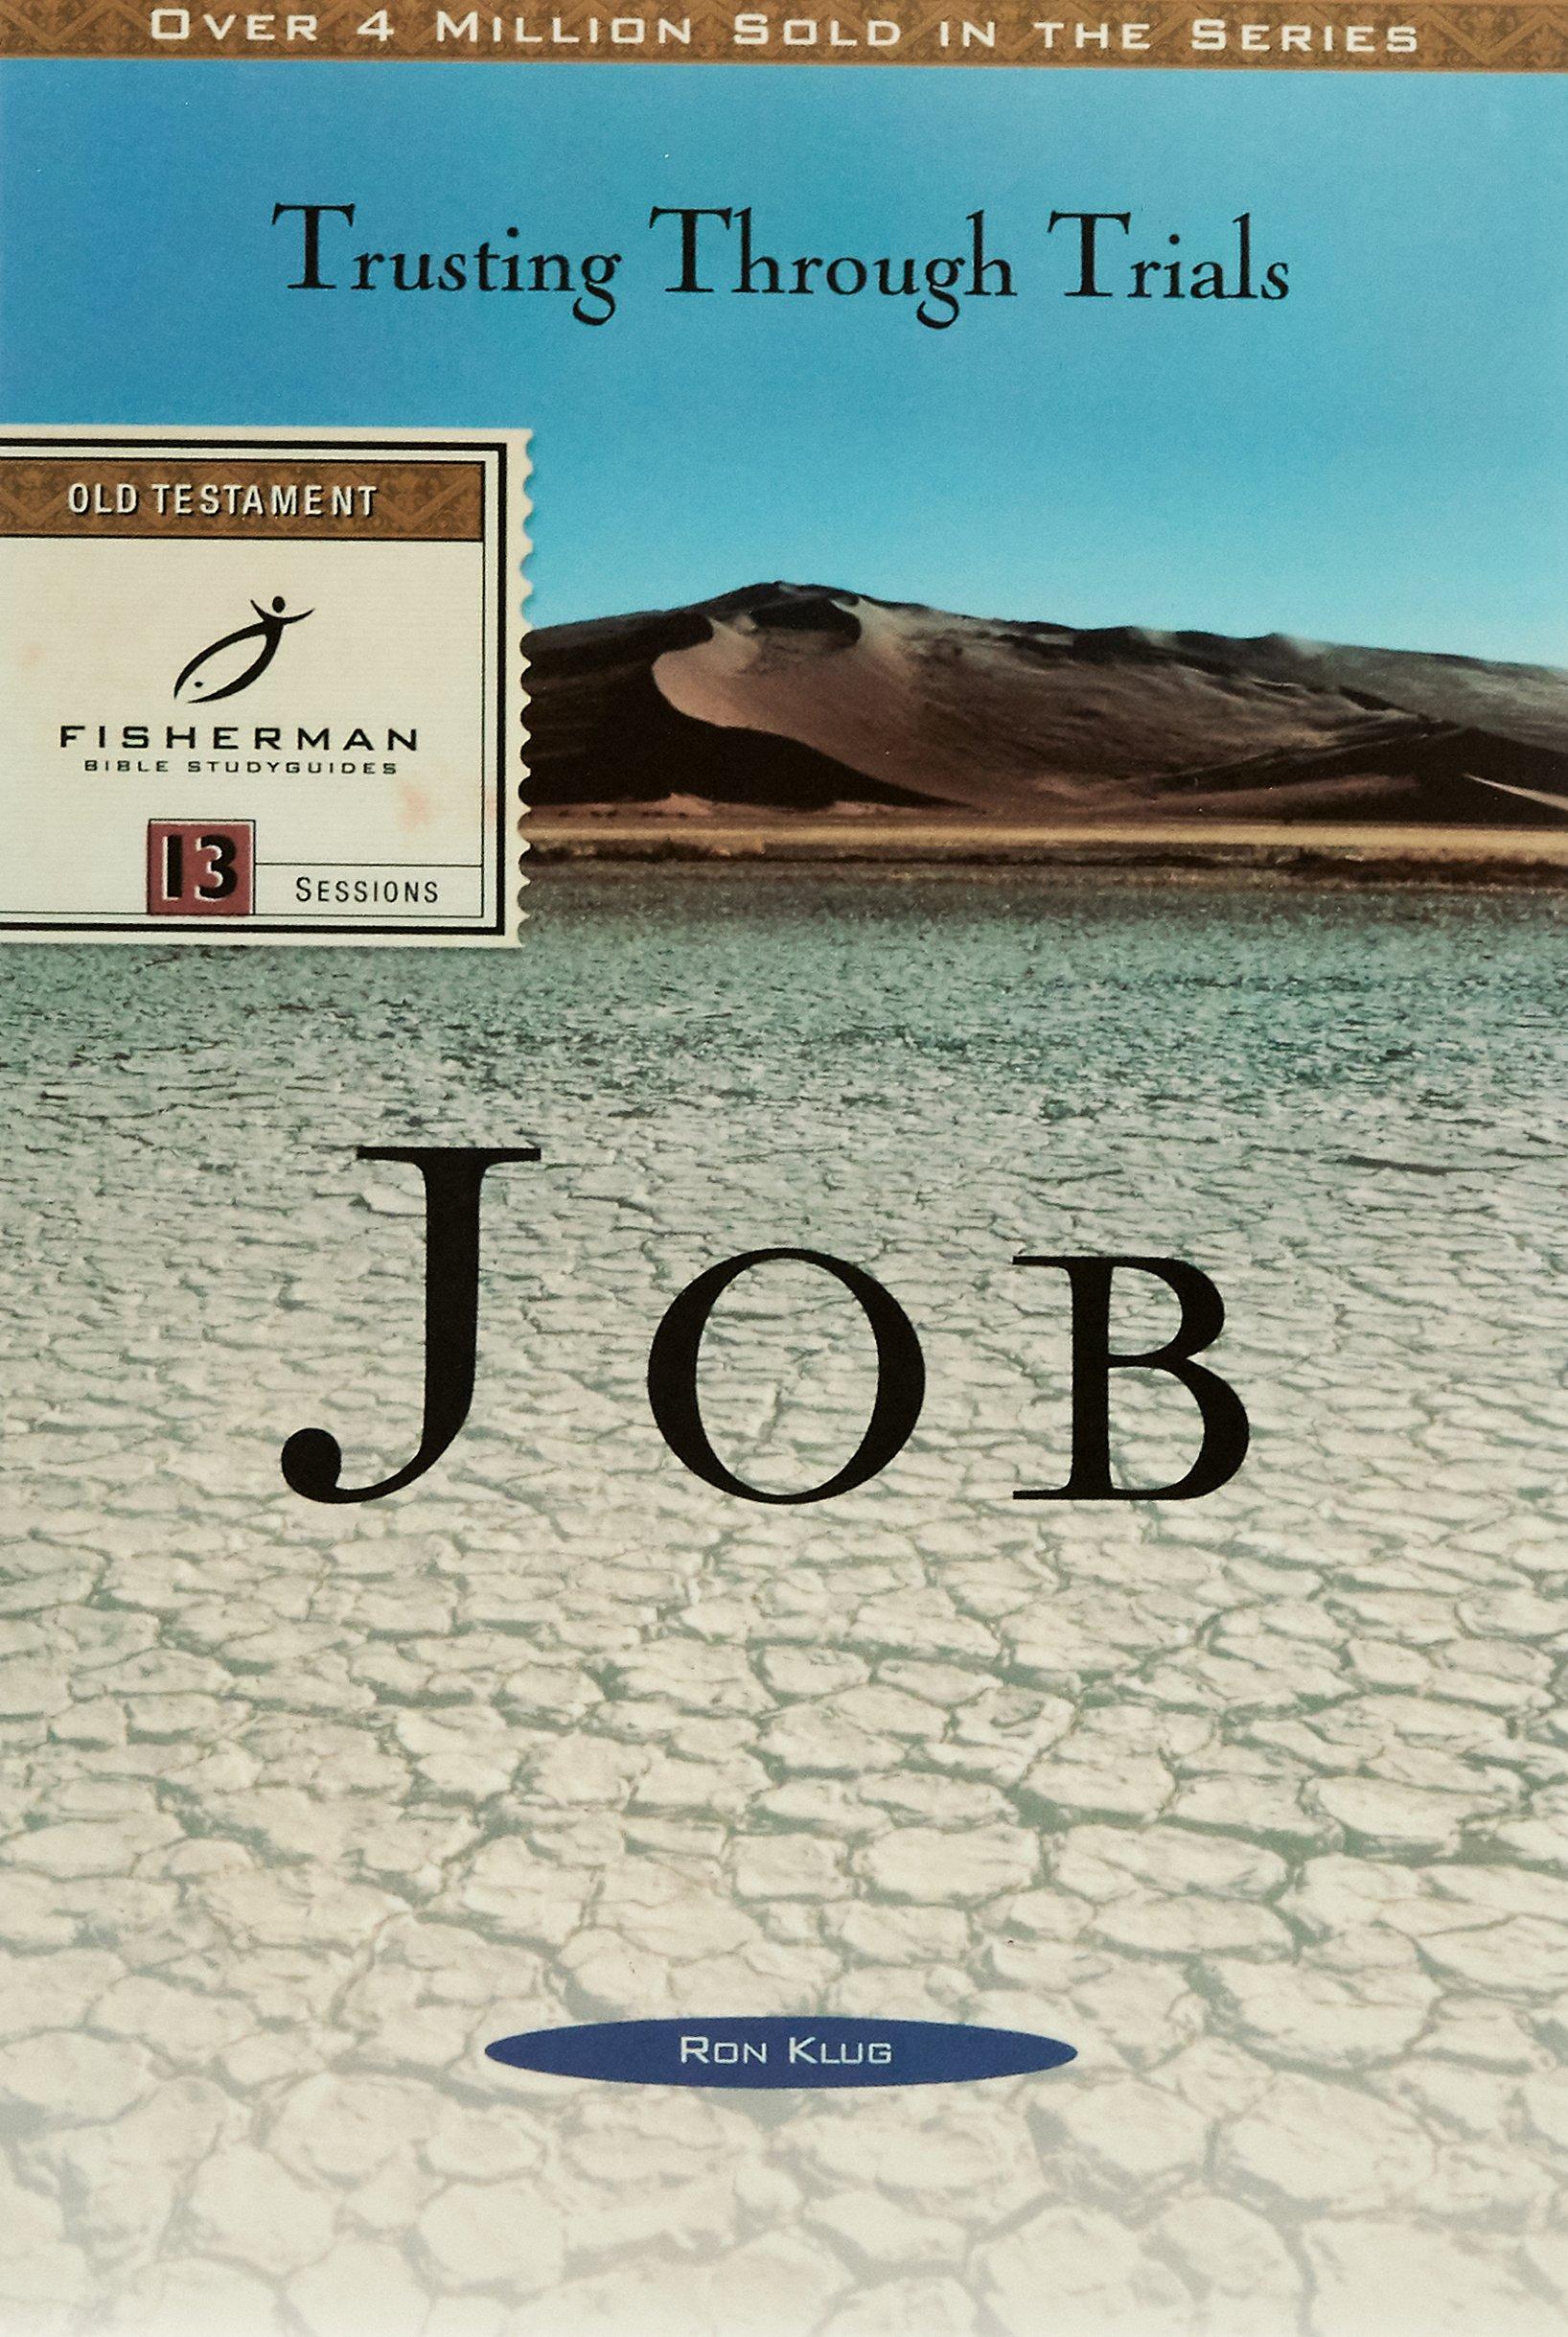 Job: Trusting Through Trials (Fisherman Bible Studyguides)